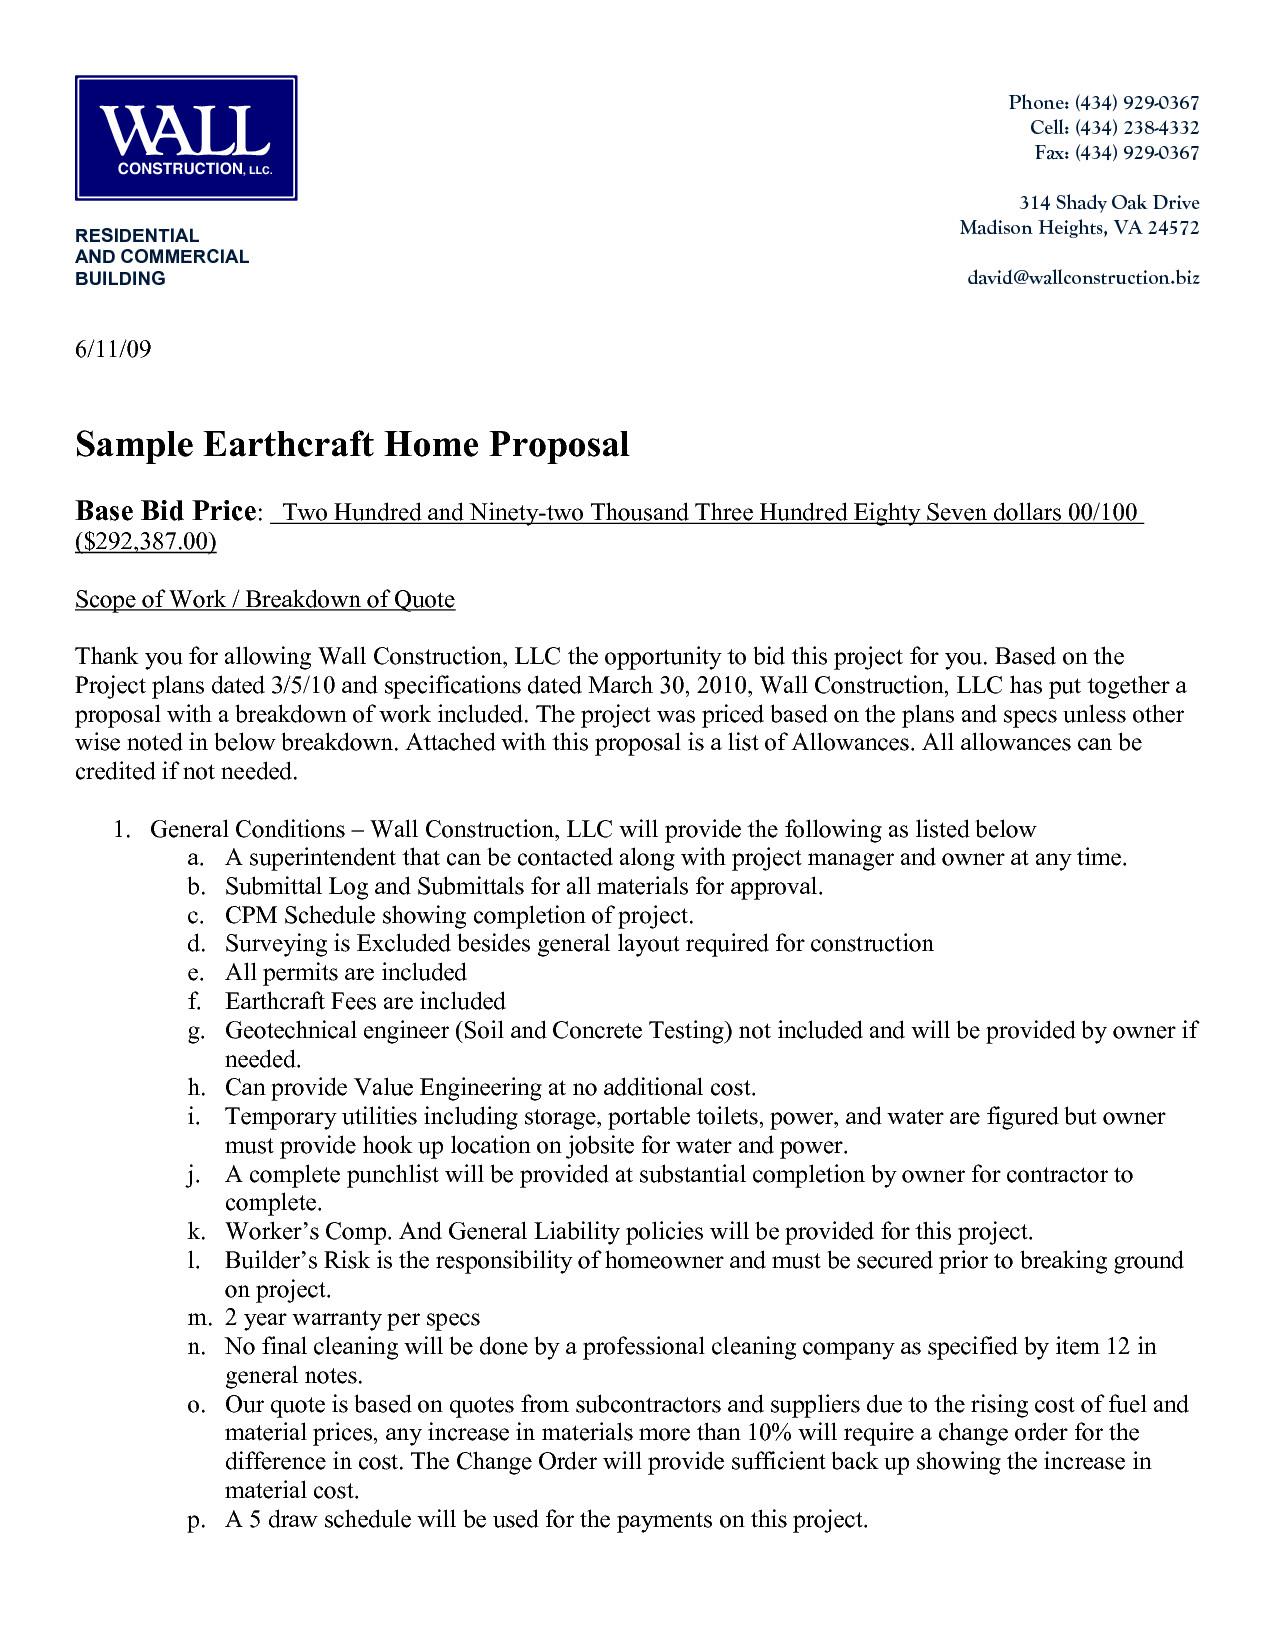 Construction Bid Proposal Template Sample Construction Quote Template Construction Proposal